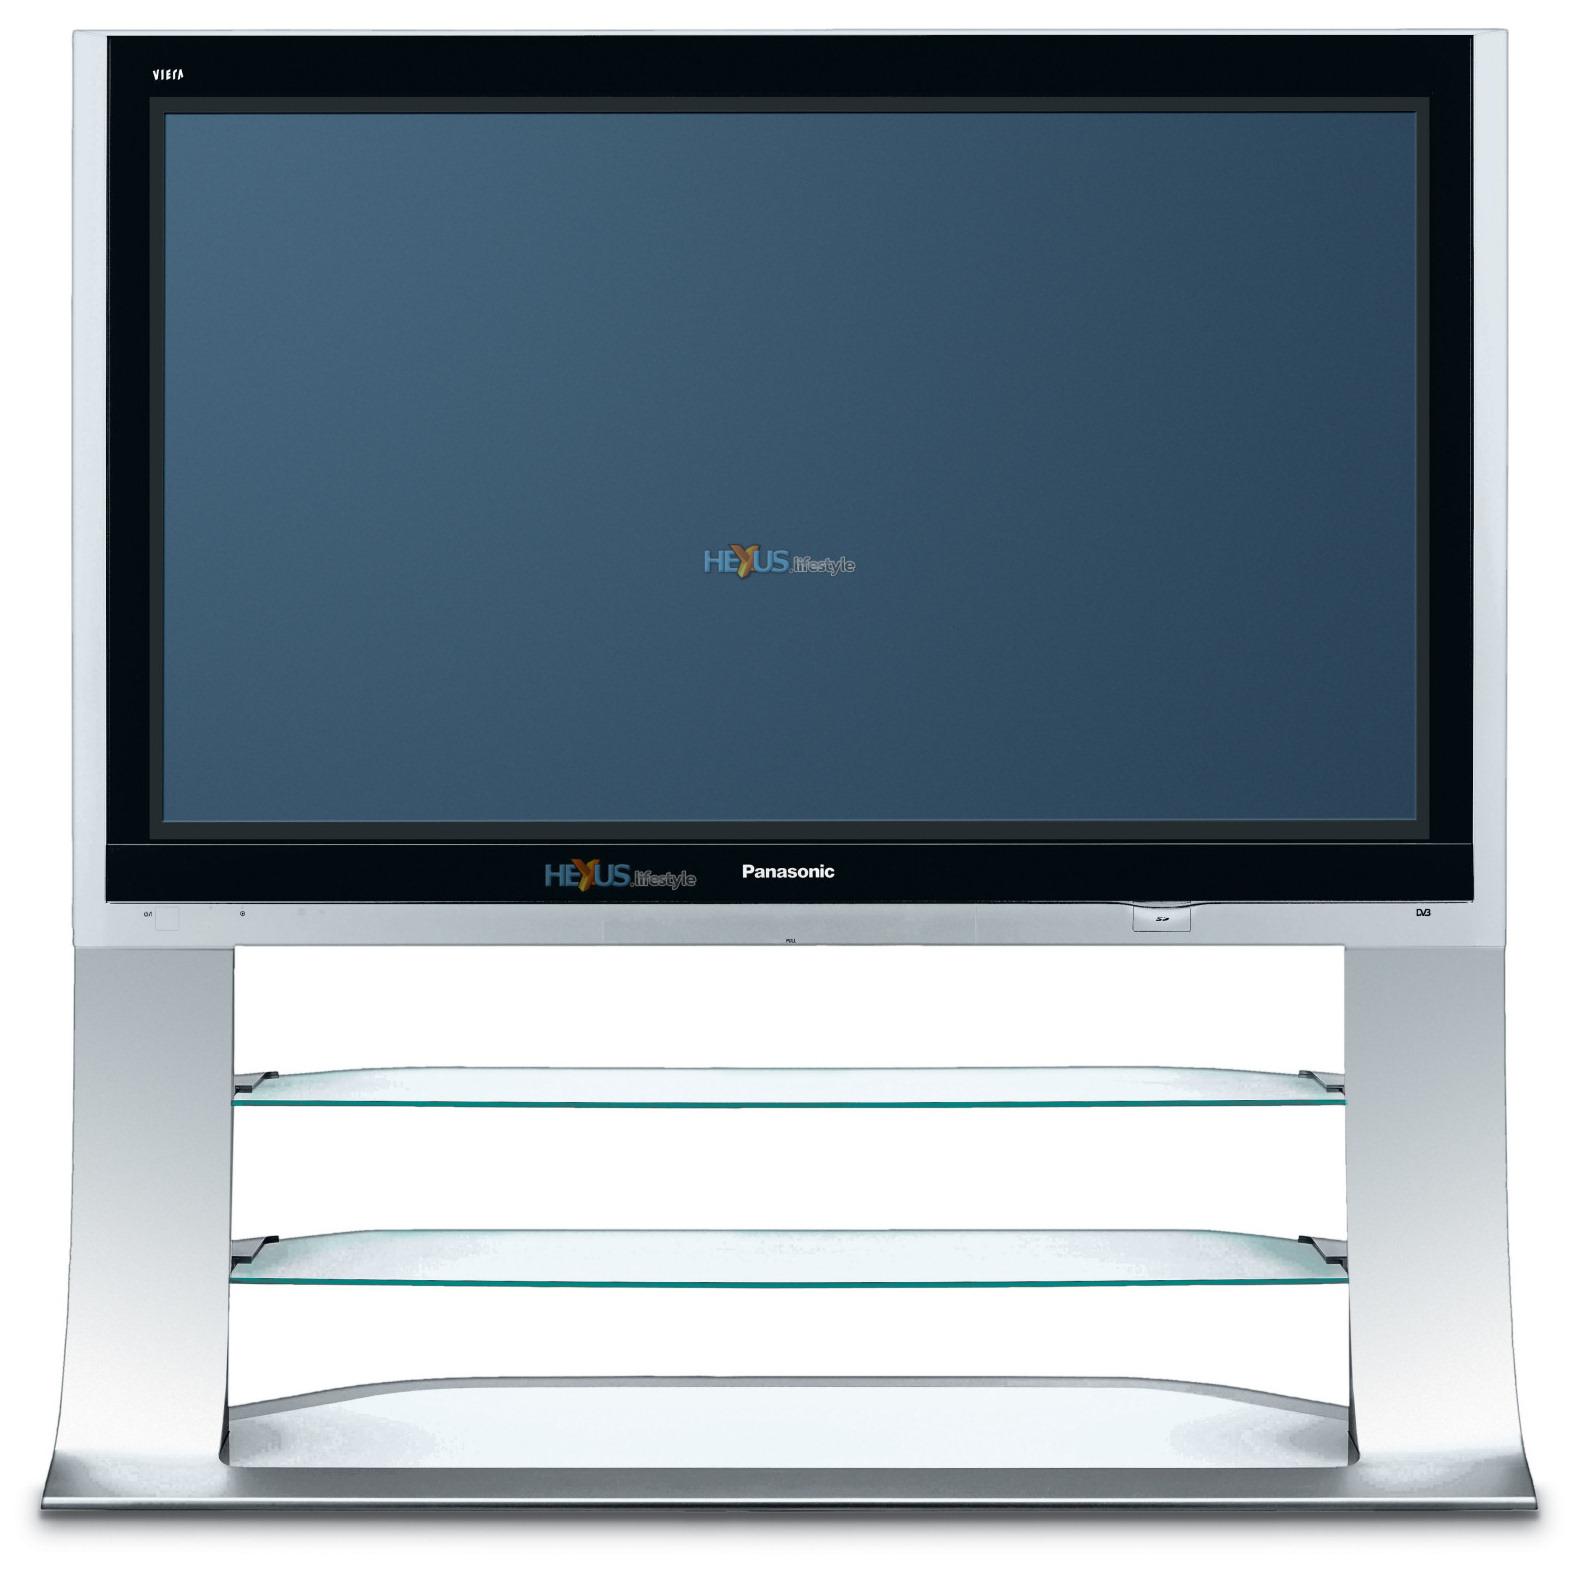 Panasonic Plasma Tv Viera user Manual V1 2